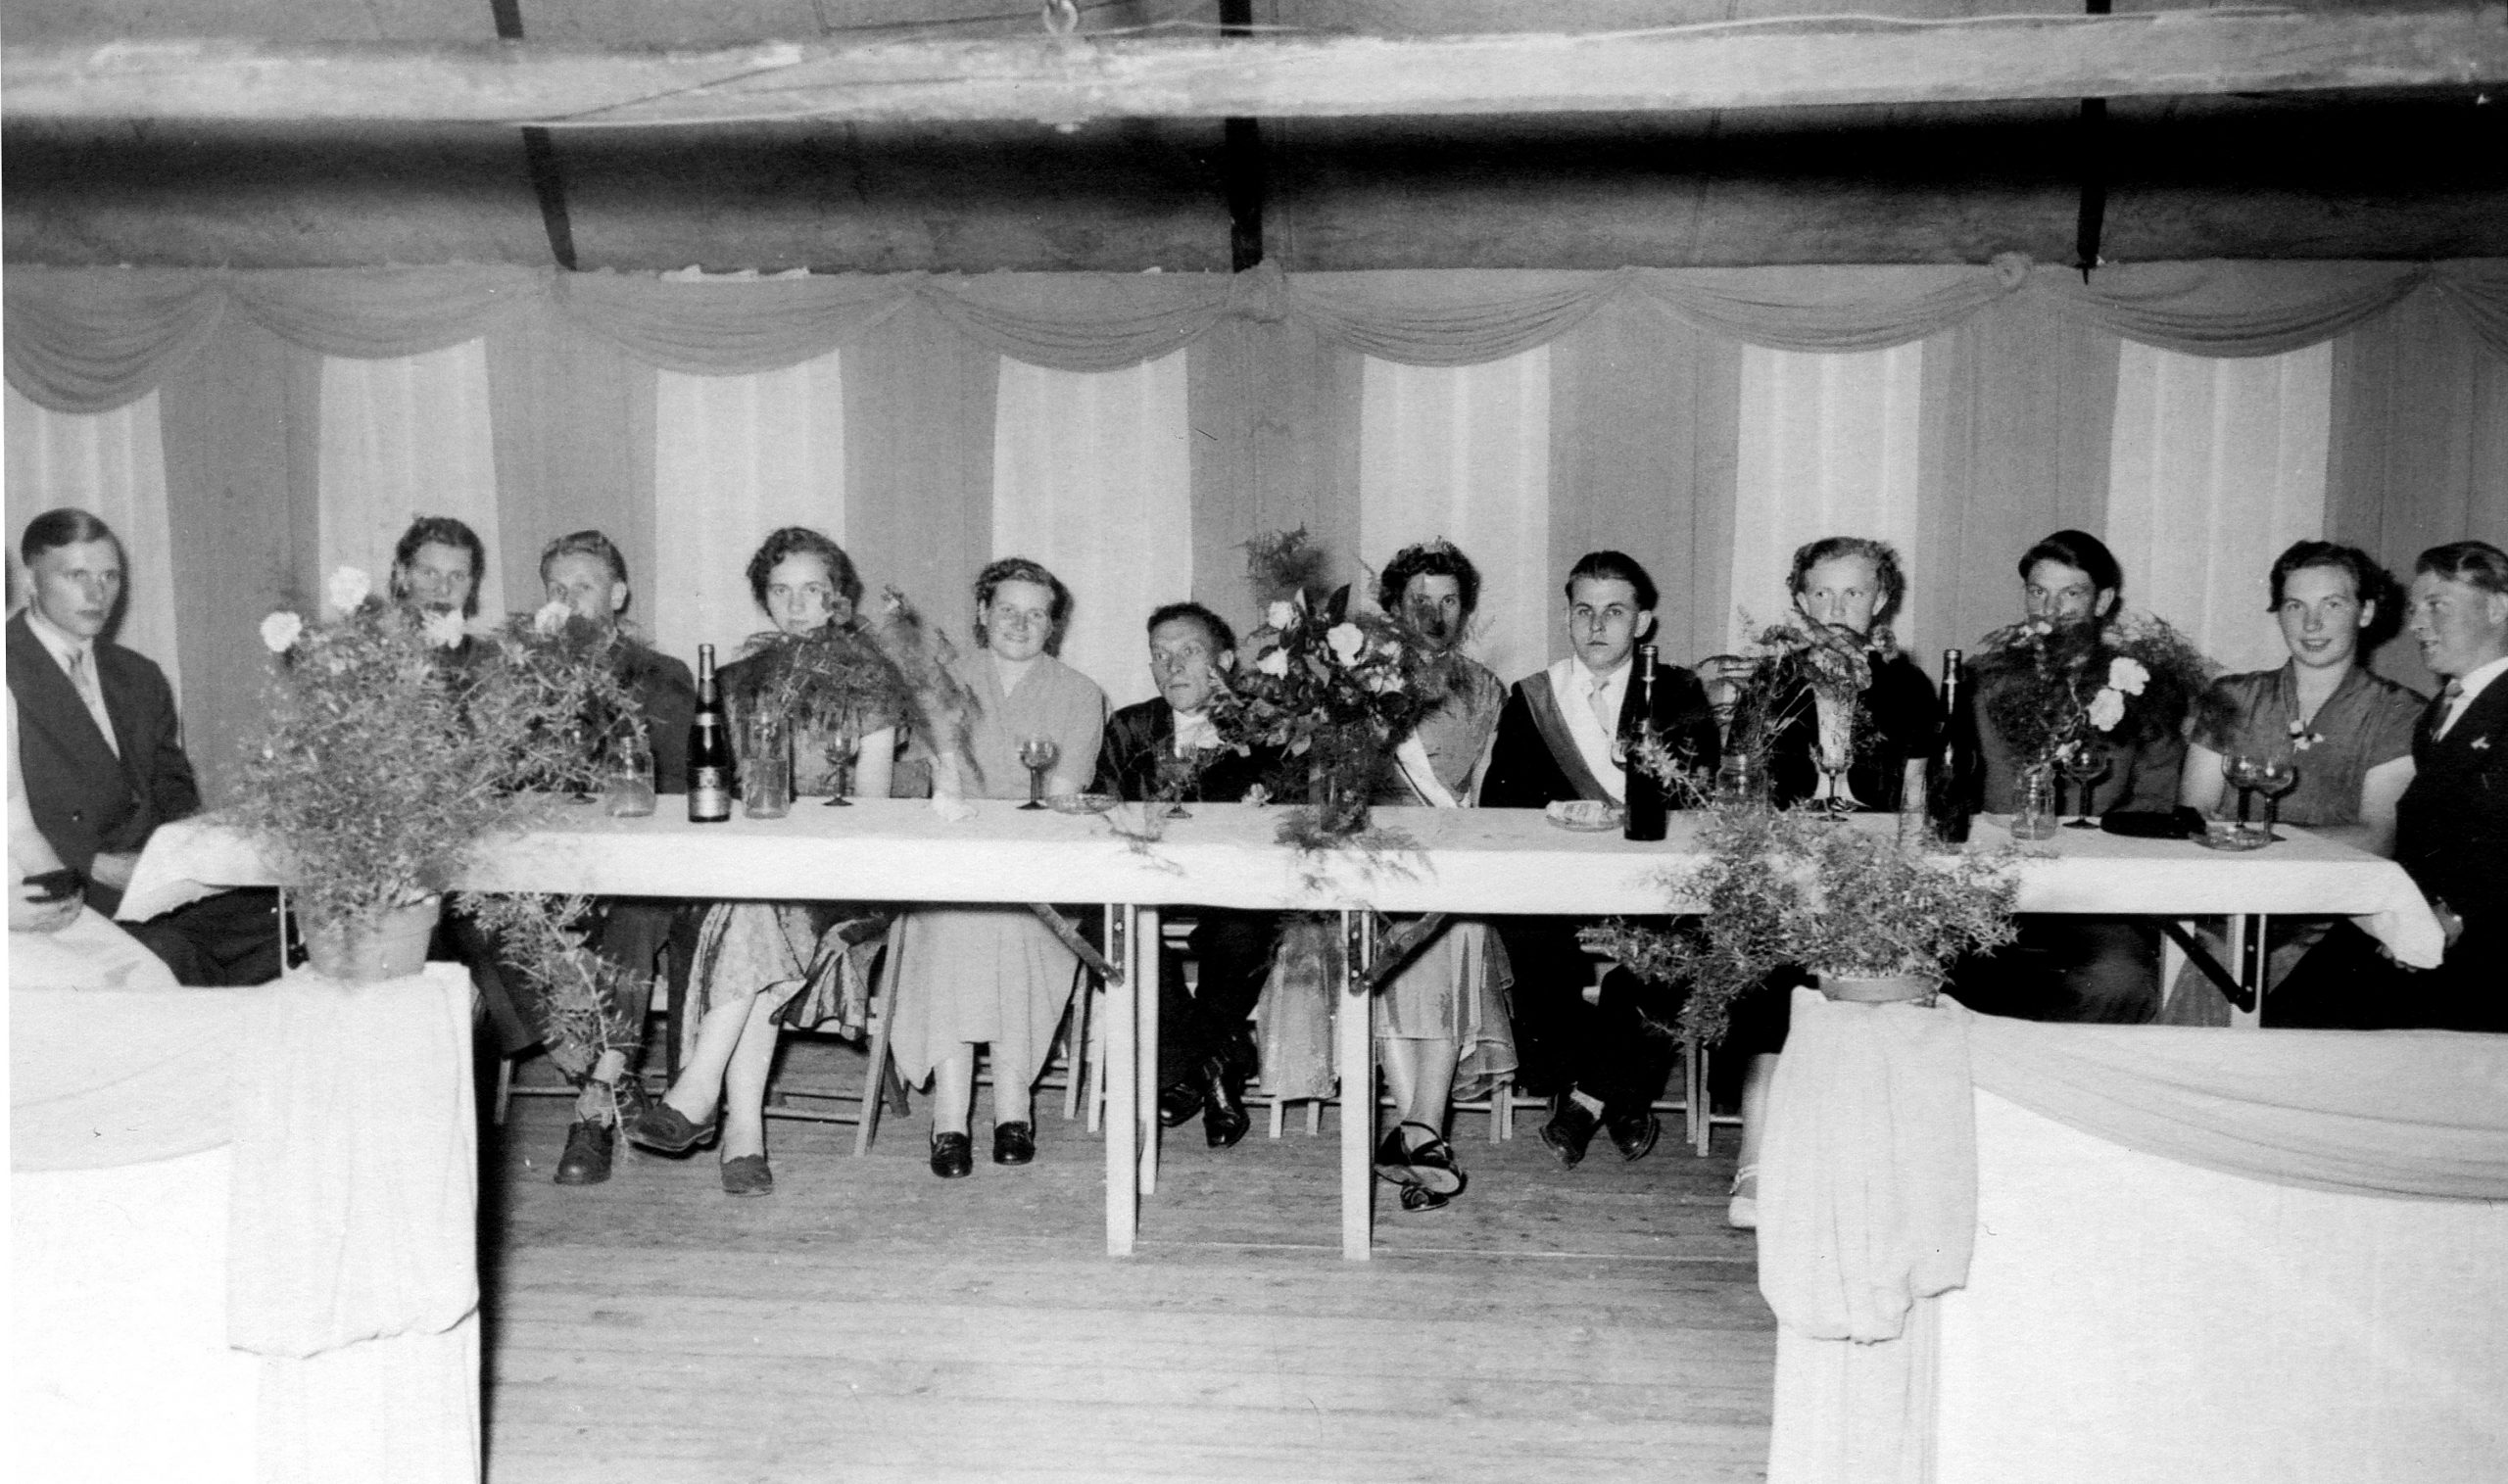 Throngesellschaft 1954